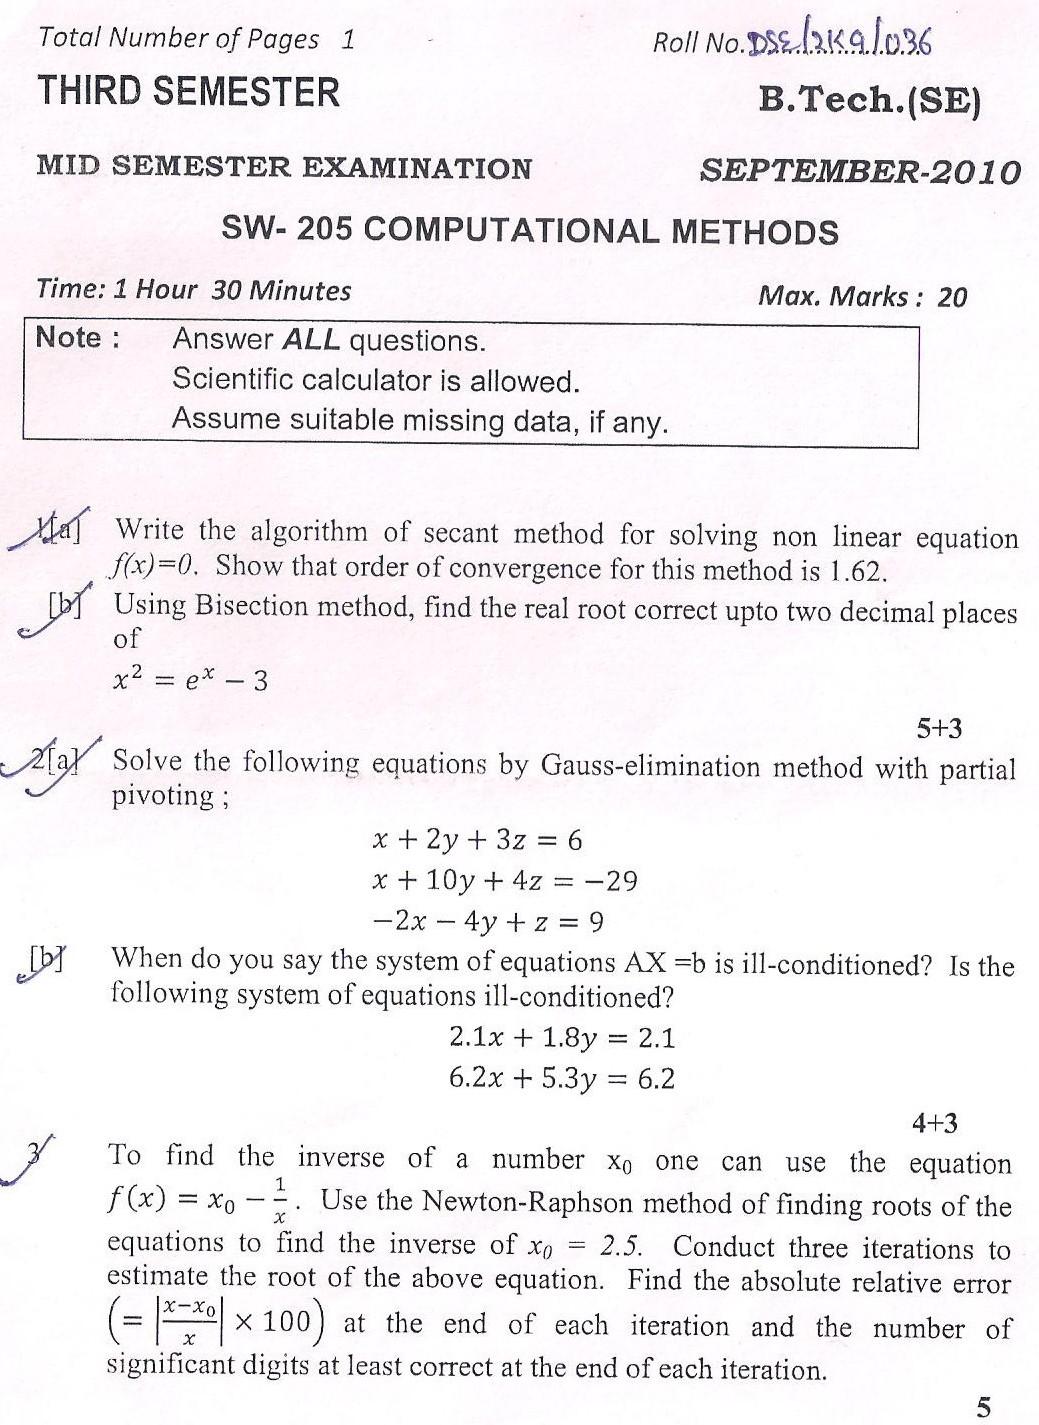 DTU Question Papers 2010 – 3 Semester - Mid Sem - SW-205